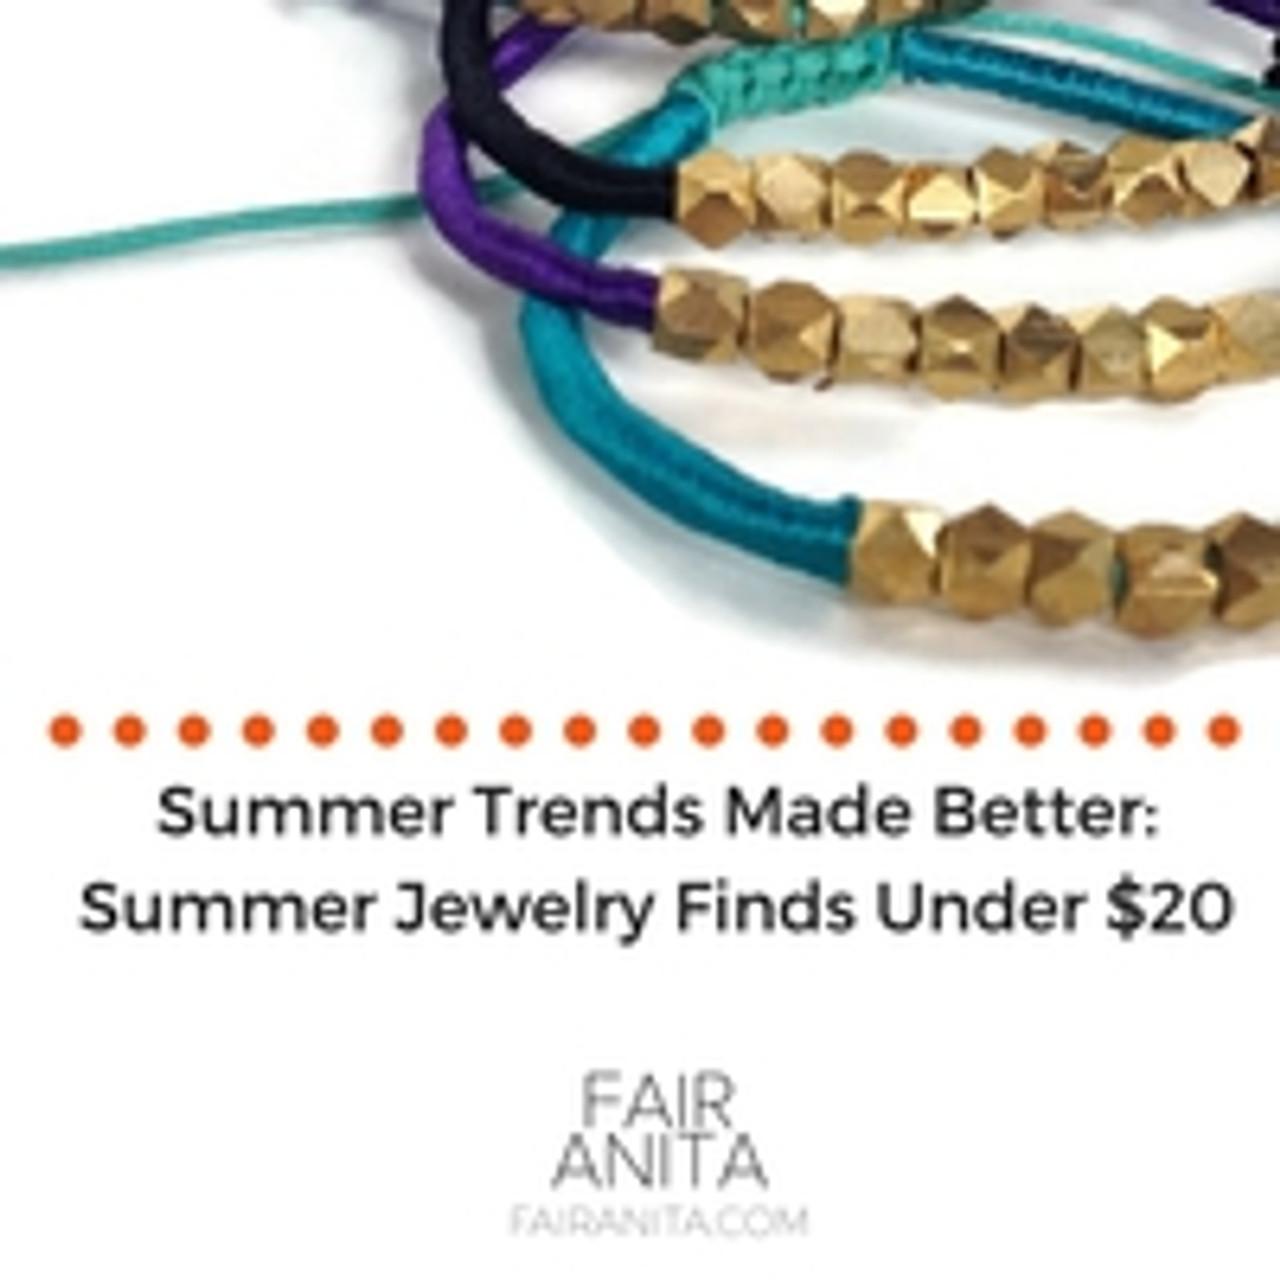 Summer Trends Made Better: Summer Jewelry Finds Under $20